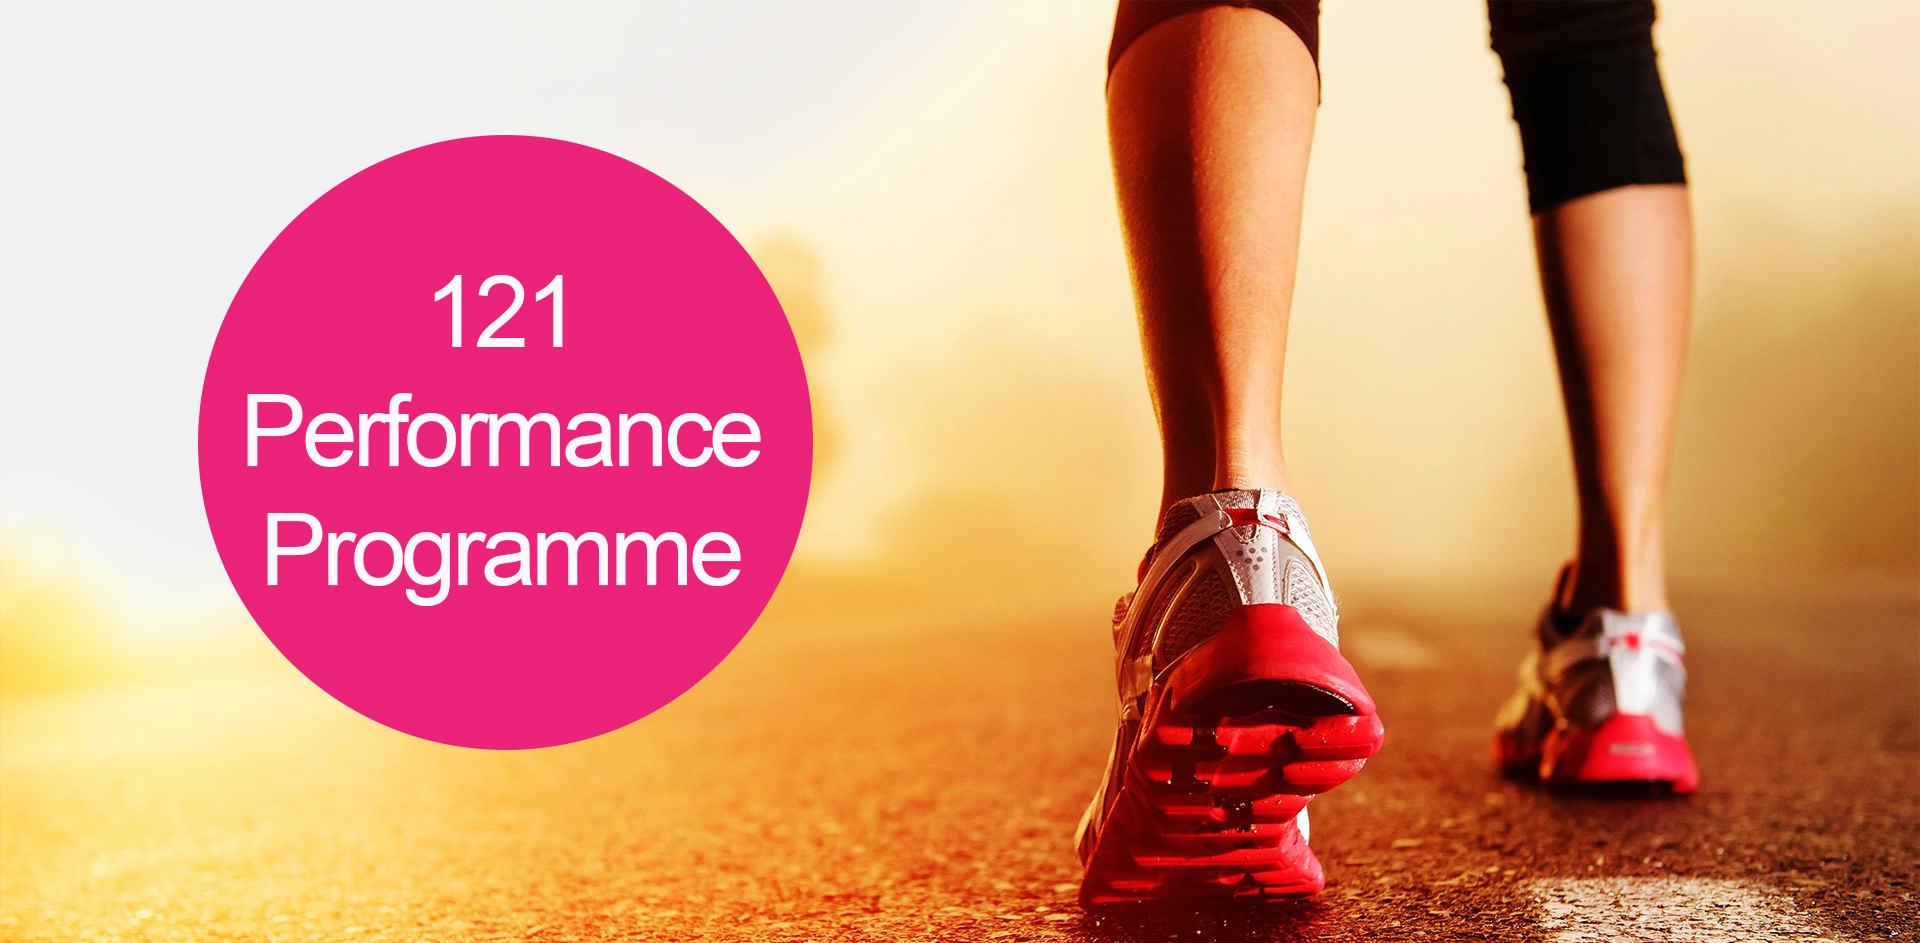 121 Performance Programme